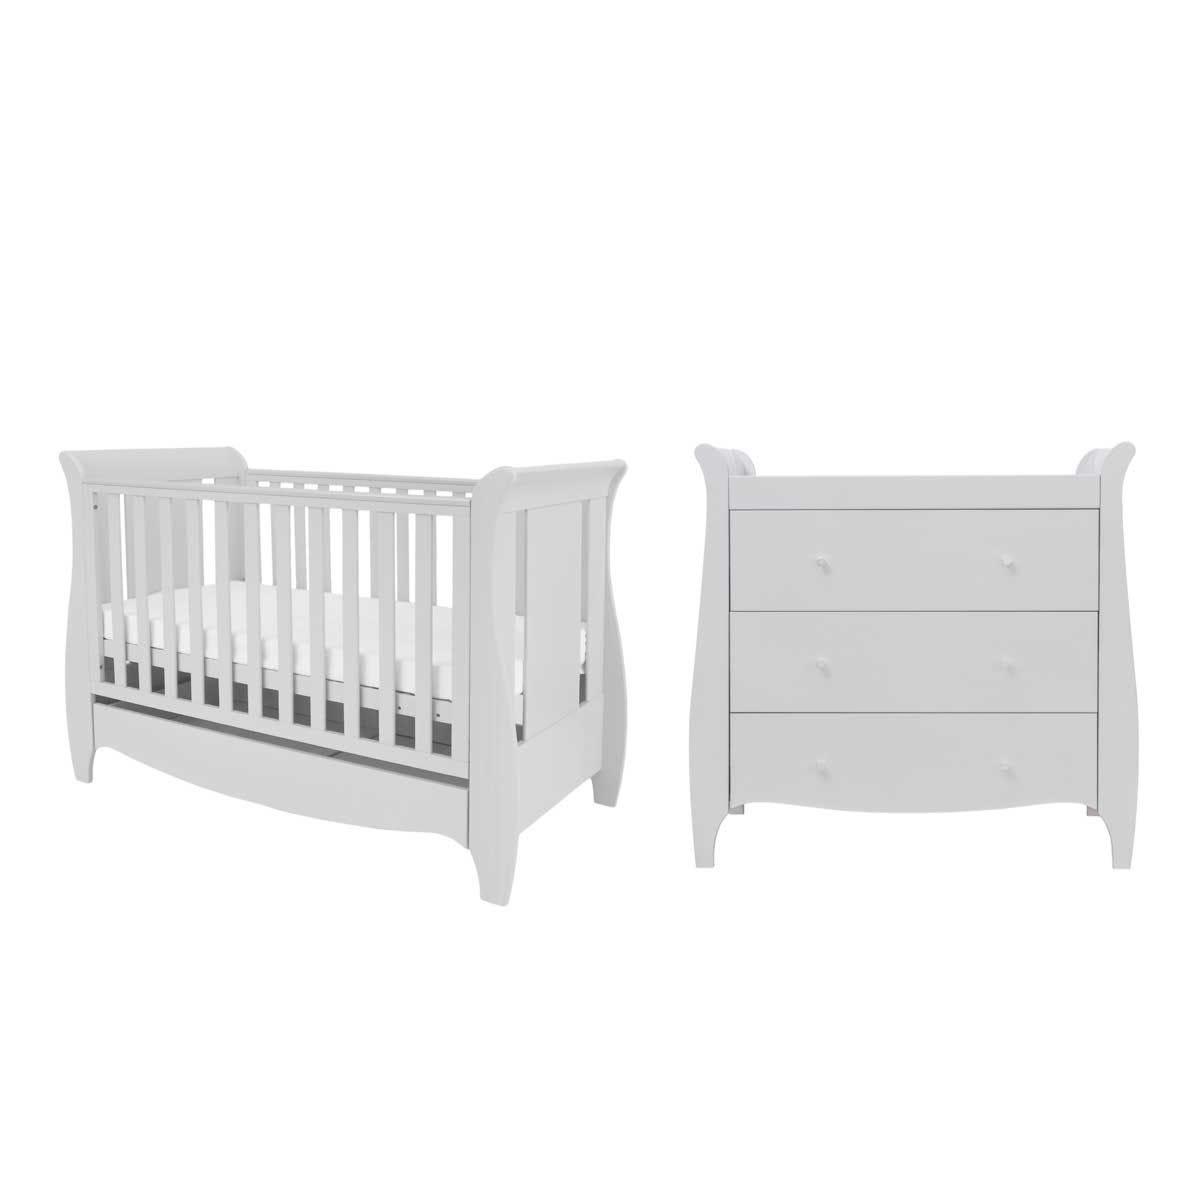 Tutti Bambini Roma Mini 2 Piece Room Set - Dove Grey